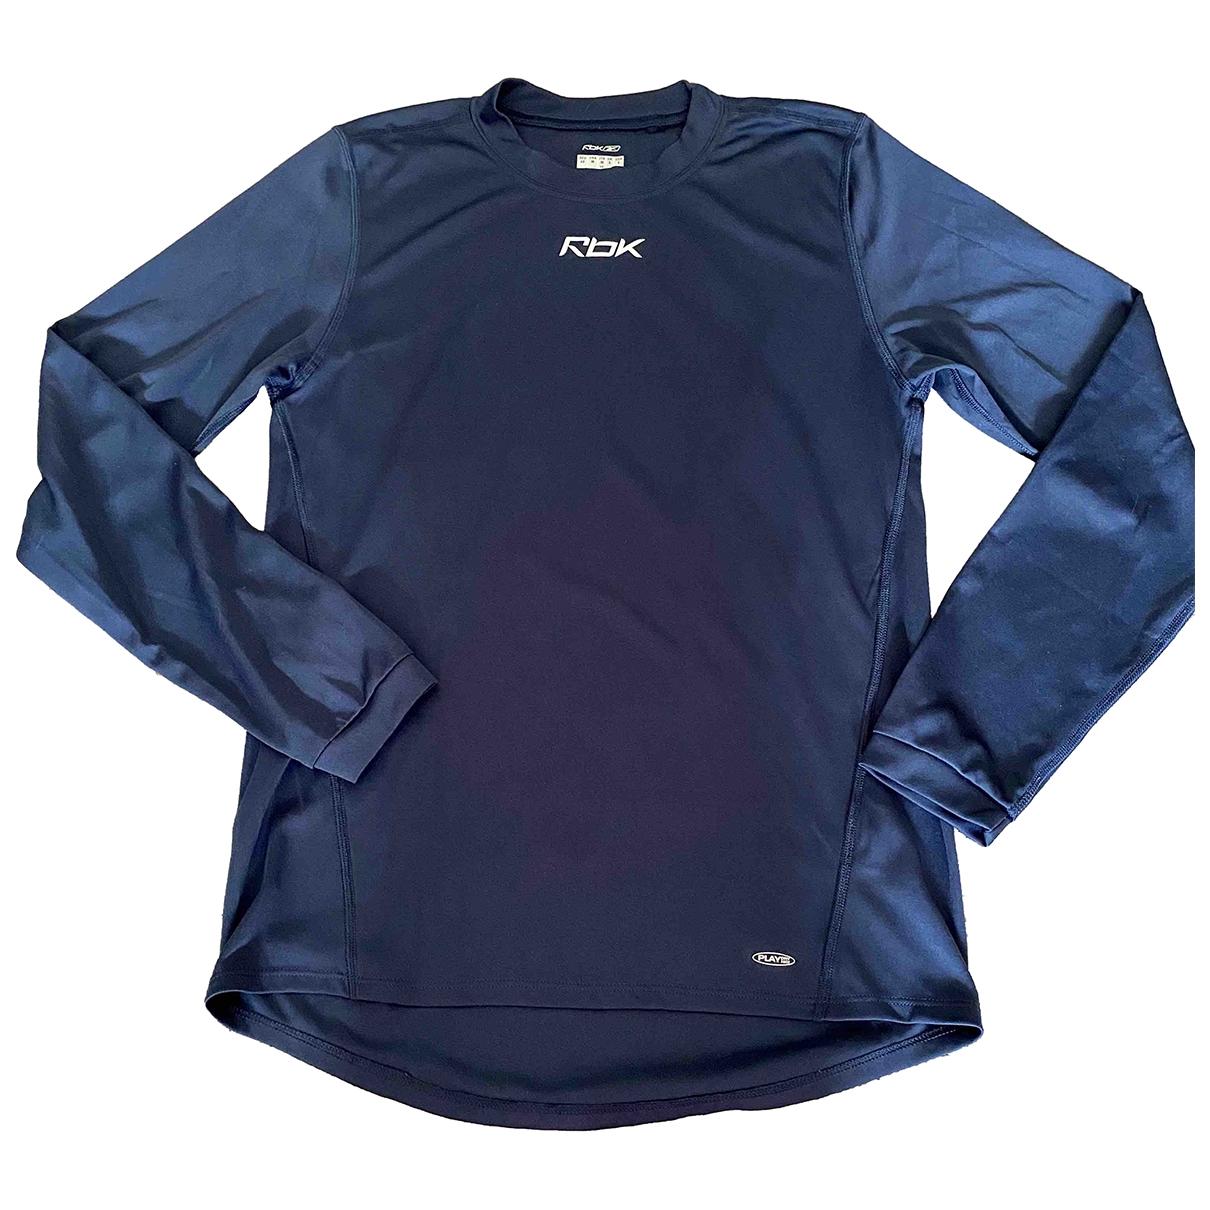 Reebok \N Blue Shirts for Men S International